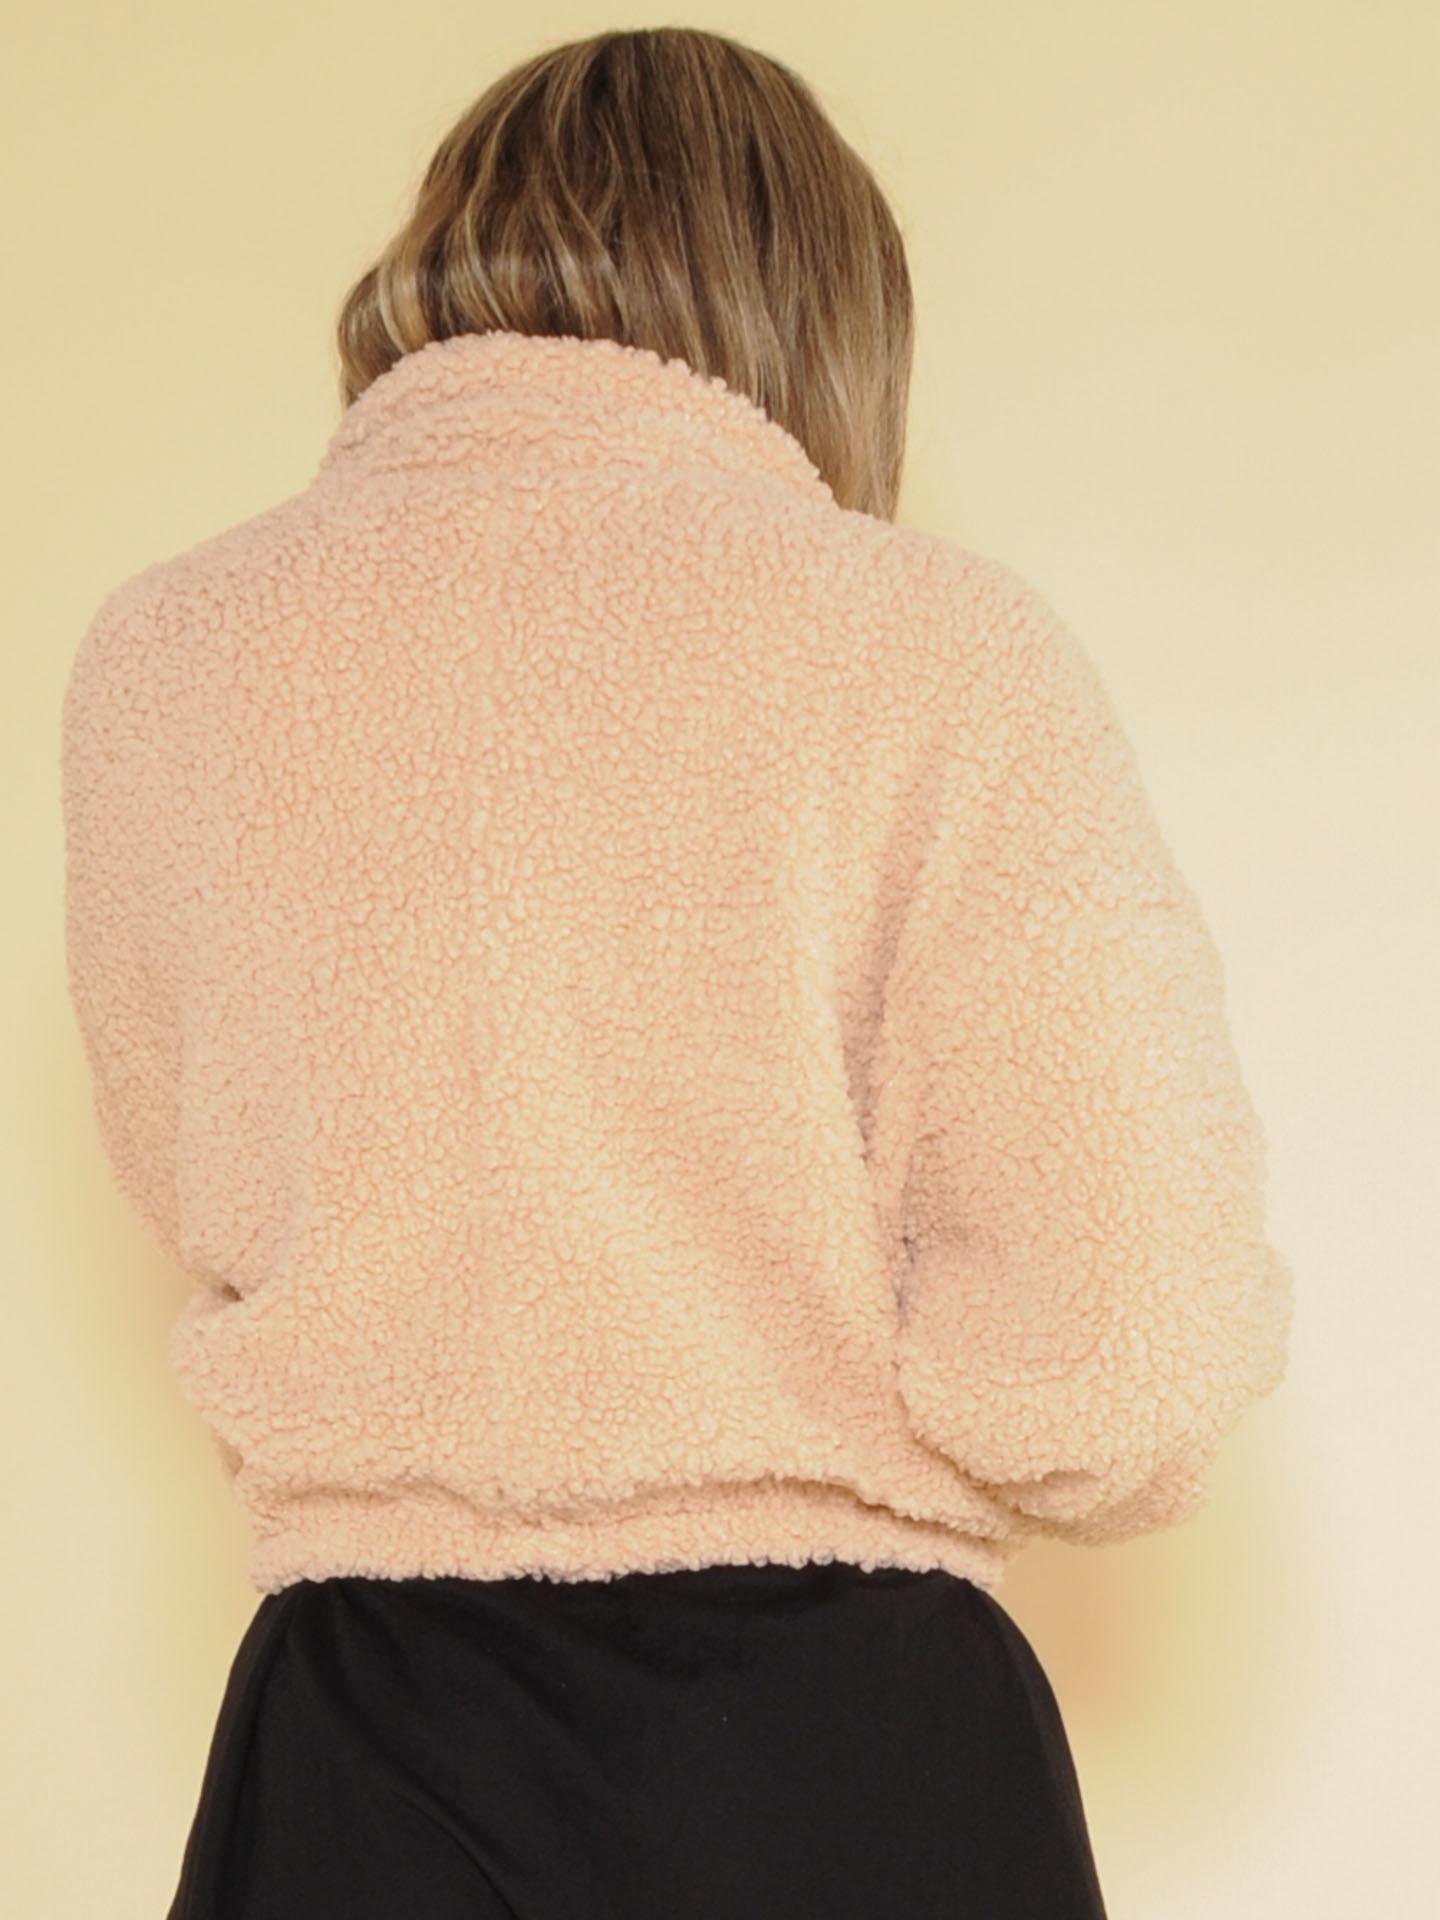 Karen Jacket Cropped Crushed Faux Fur Zip Up Back